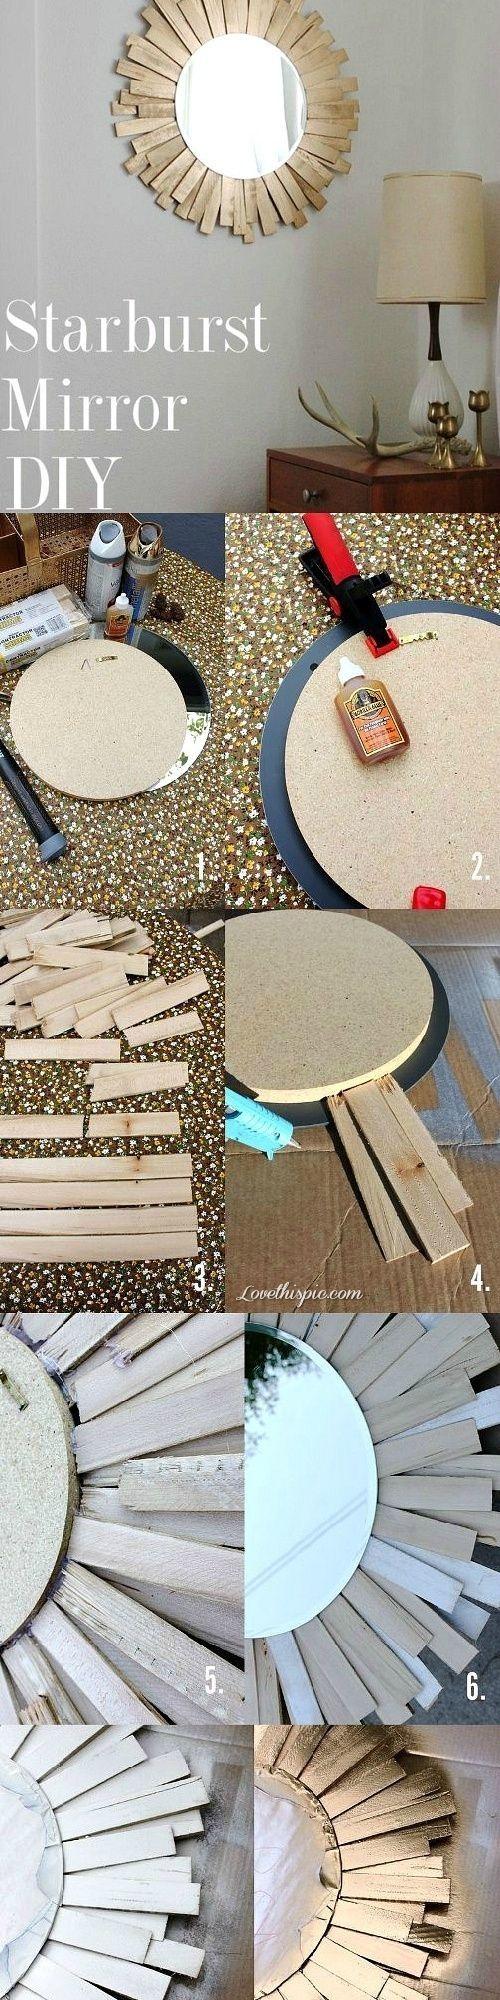 DIY starburst mirror diy decorating ideas crafts instructions diy decor for the home home ideas craft decor craft mirror mirrors by Jennifer Evanich Buckridge